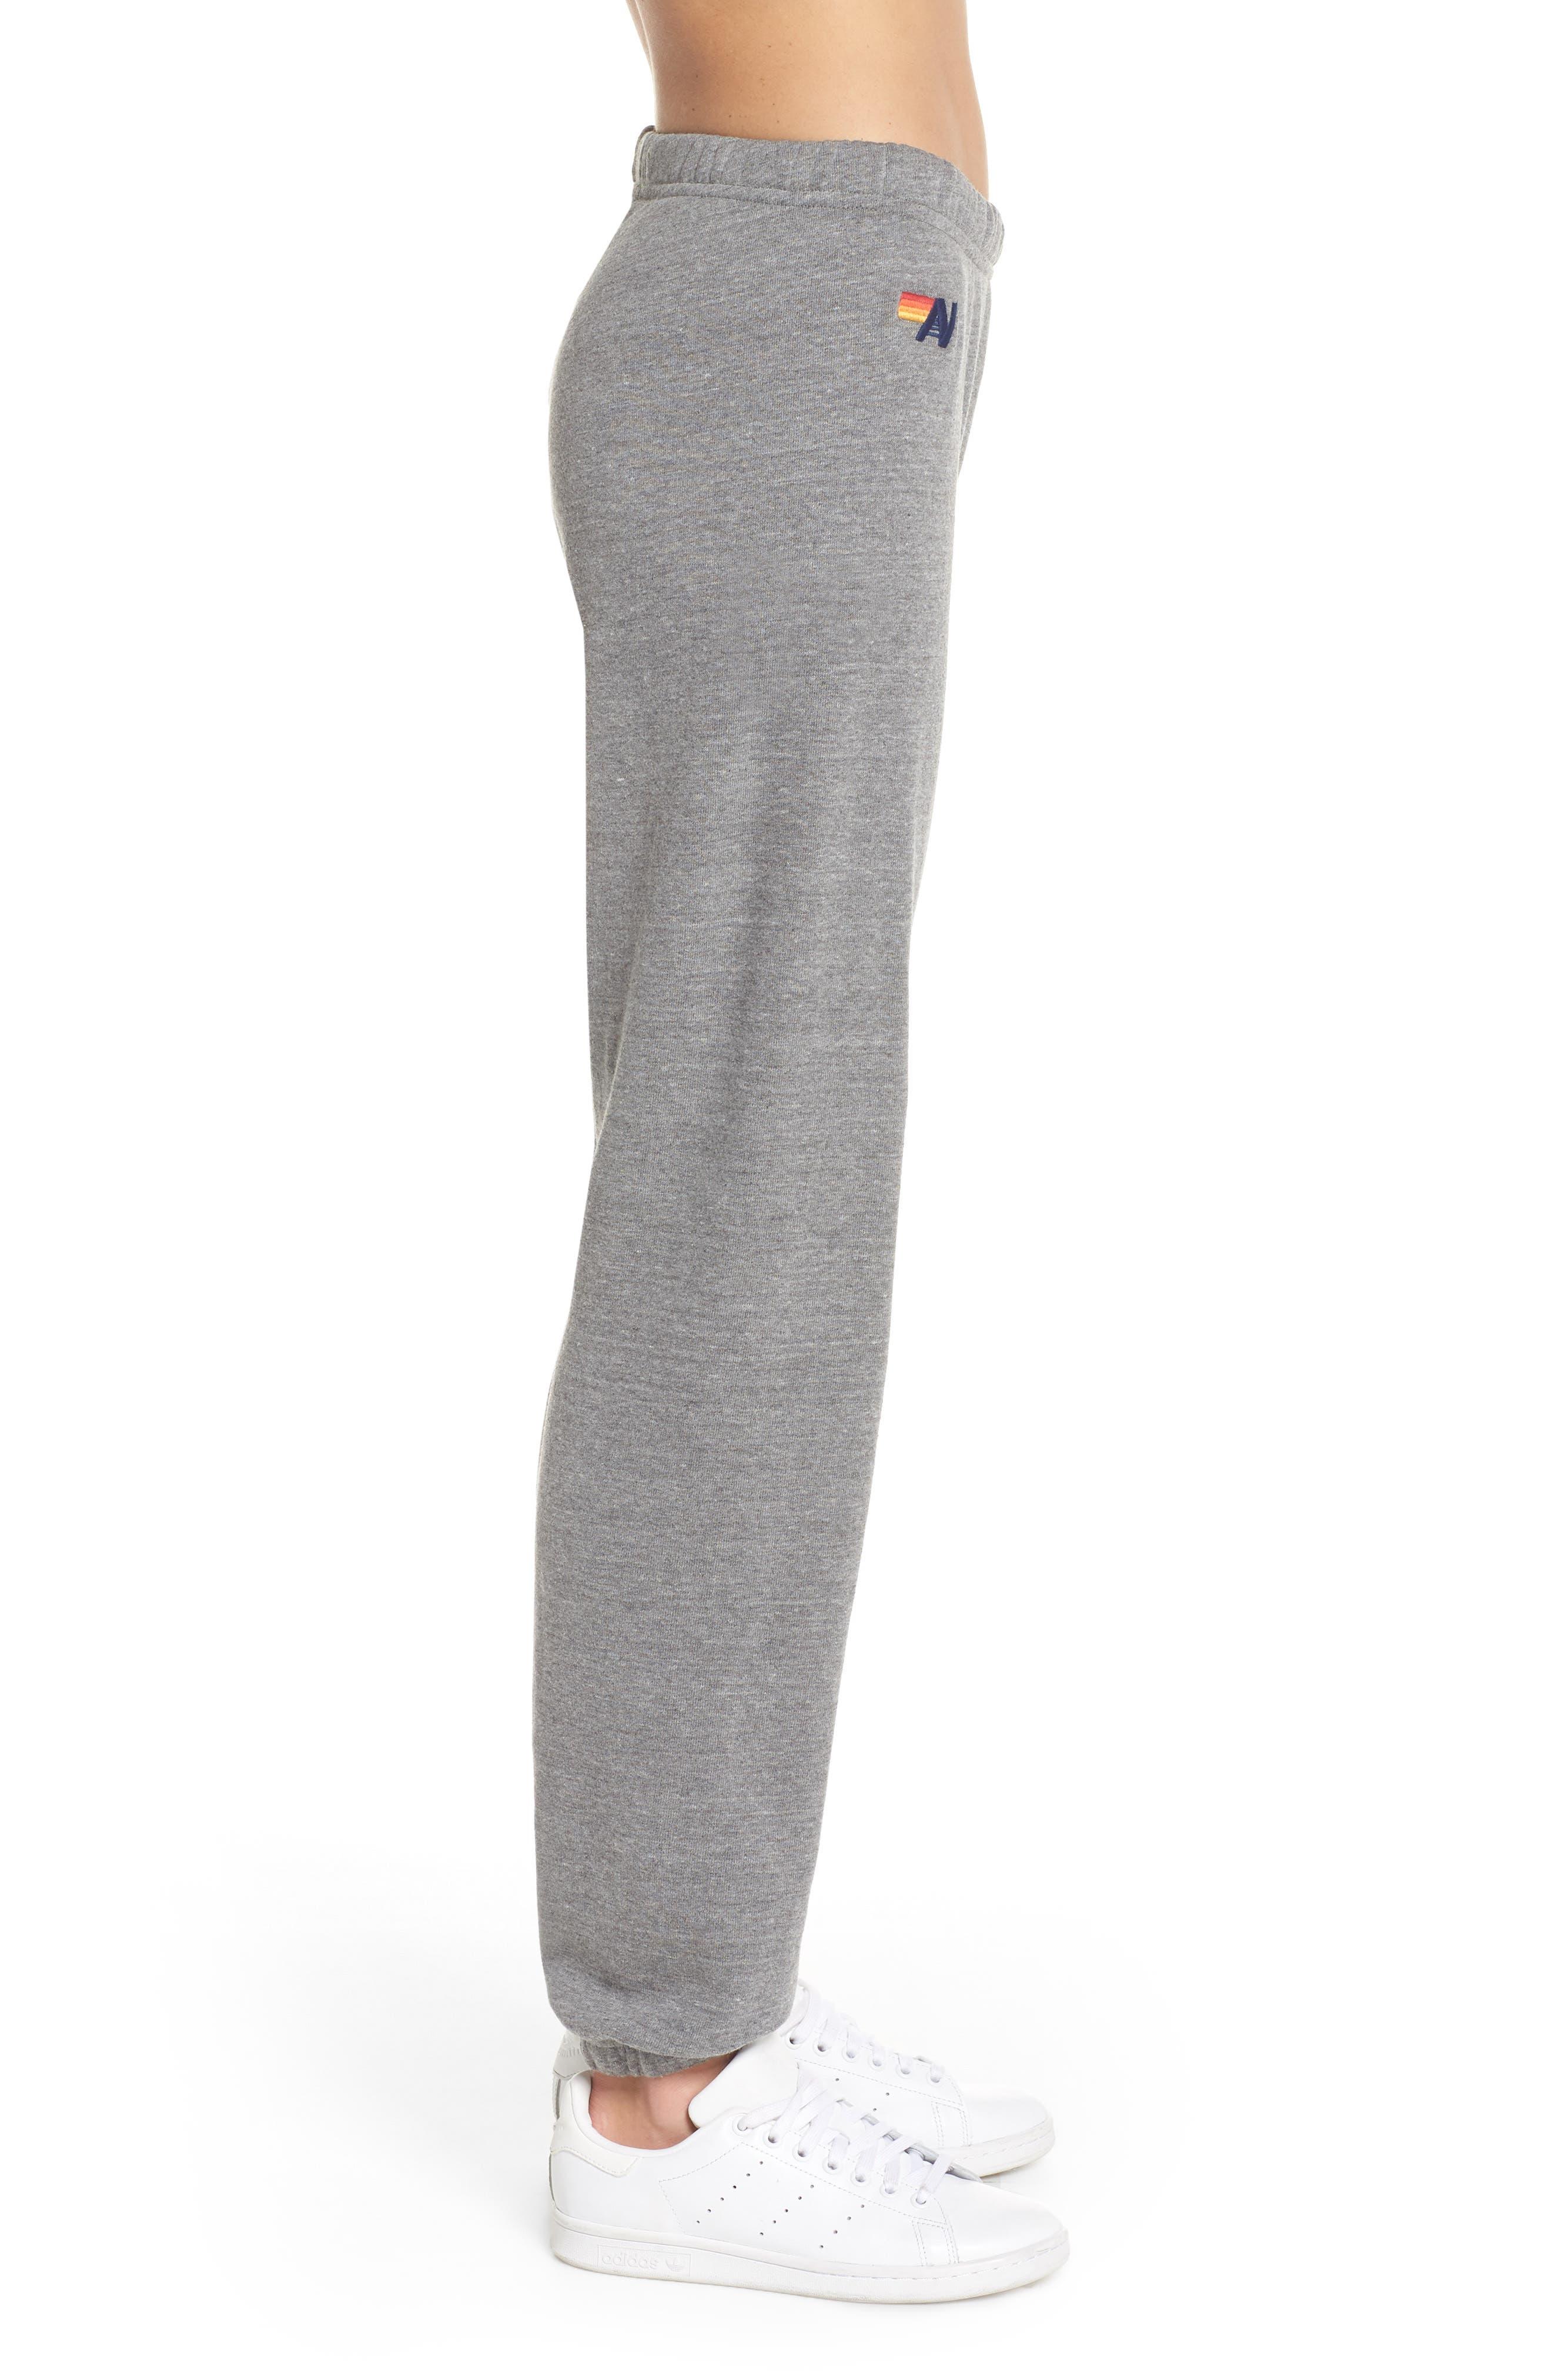 Stripe Sweatpants,                             Alternate thumbnail 3, color,                             Heather Grey/ Blue Stripes